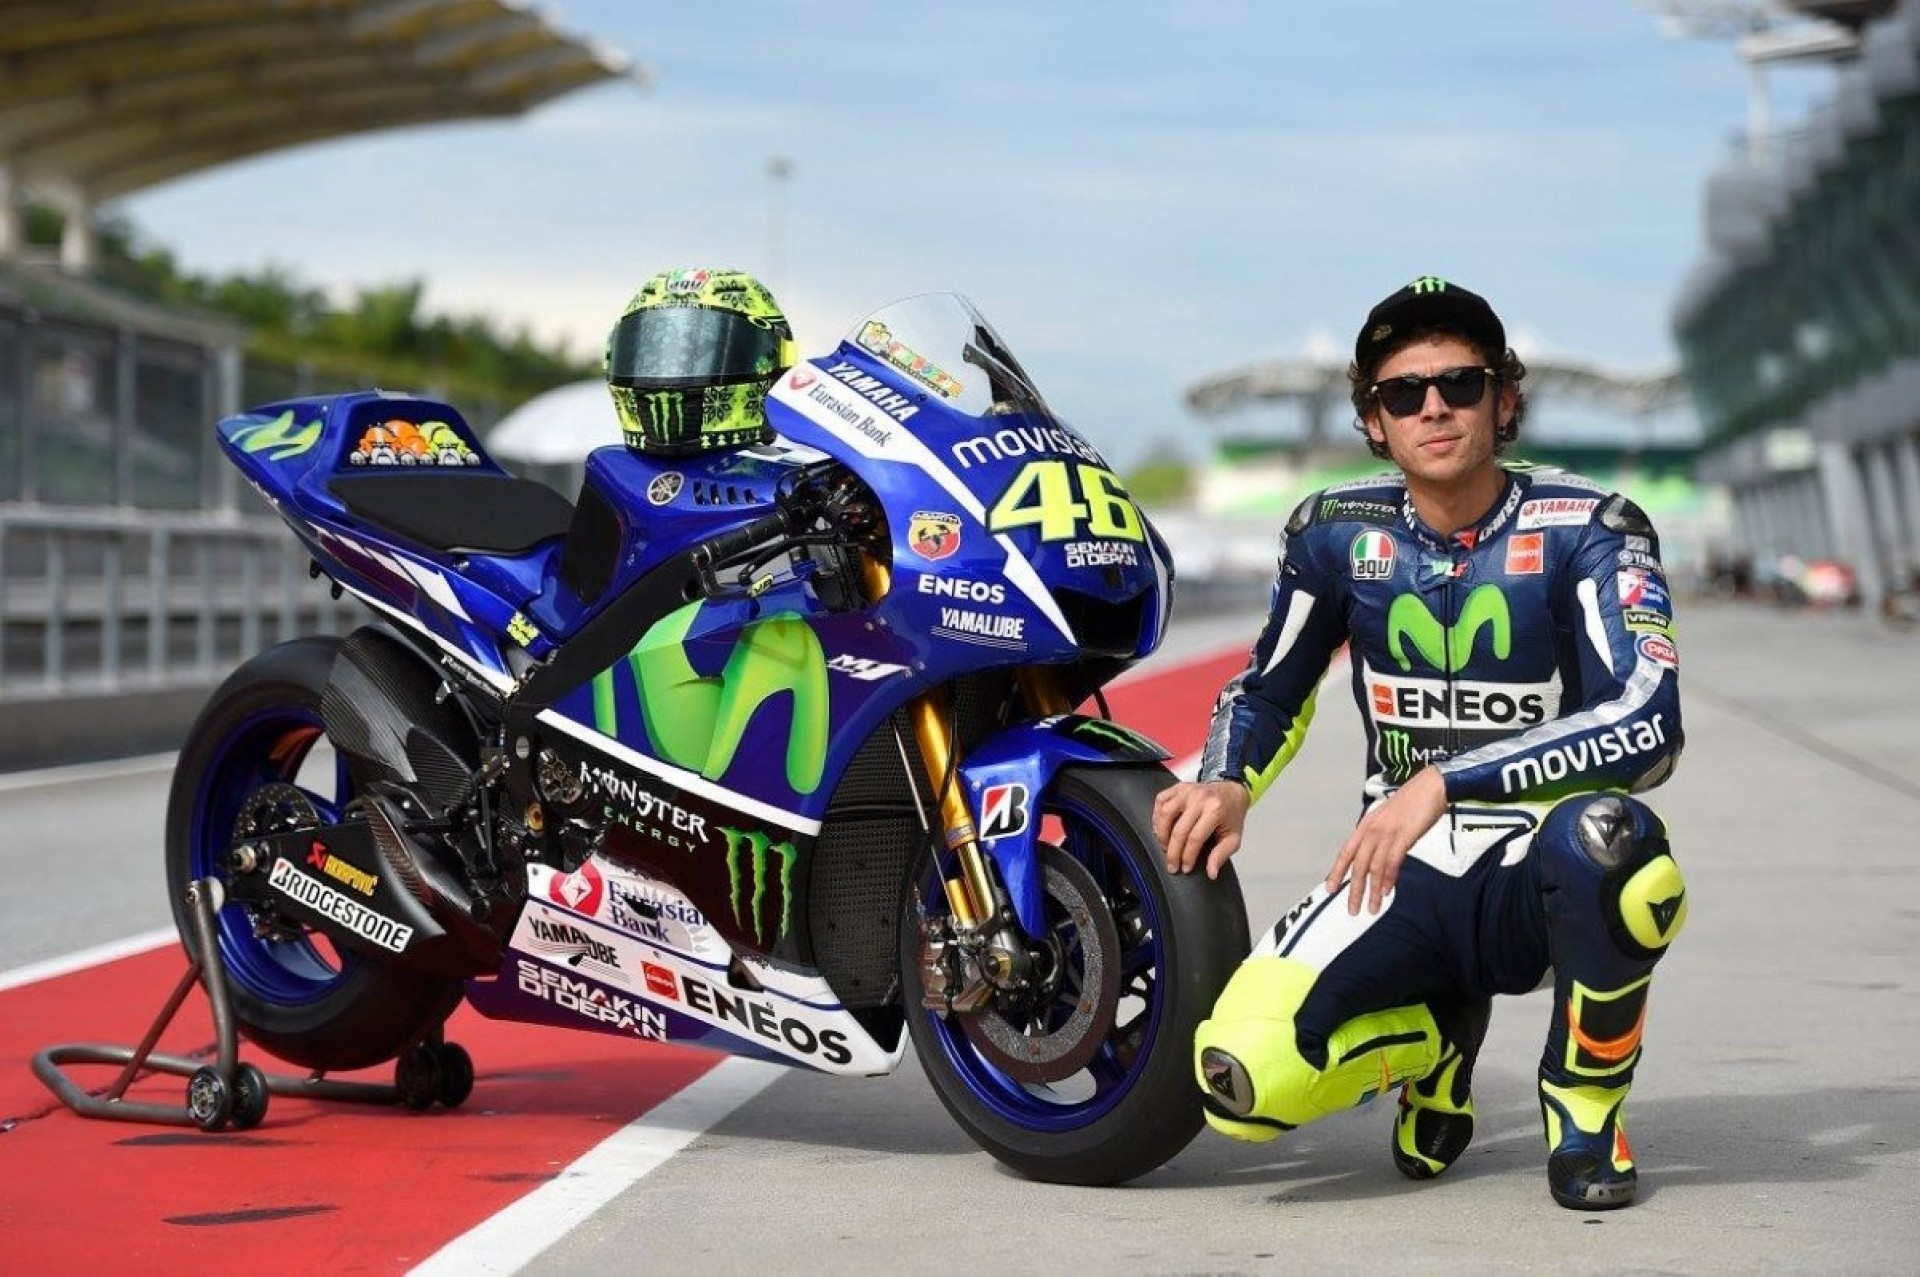 MotoGP Wallpaper Valentino Rossi 2017